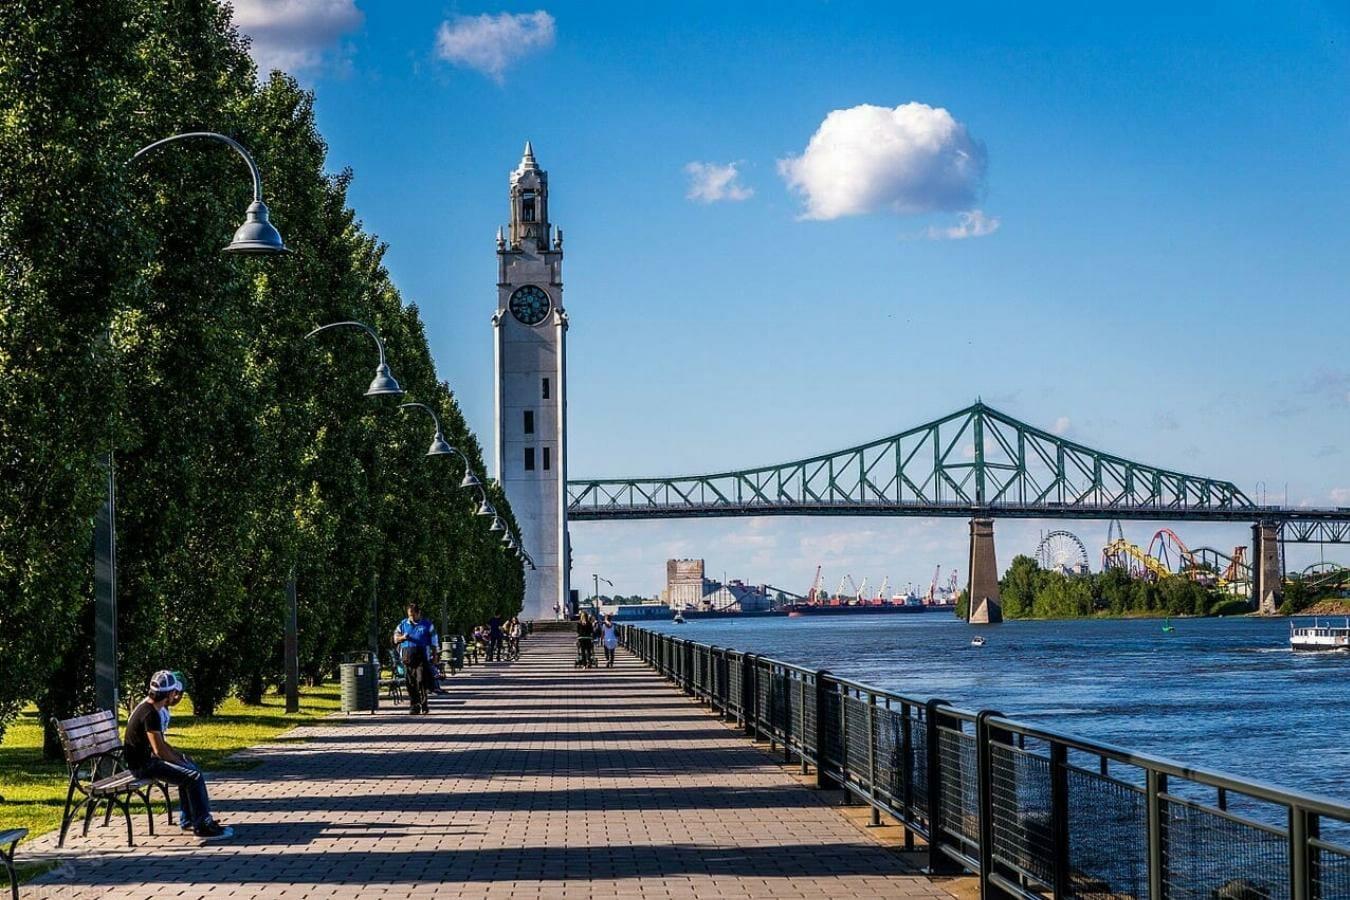 جاذبه های گردشگری کانادا: مونتریال قدیم